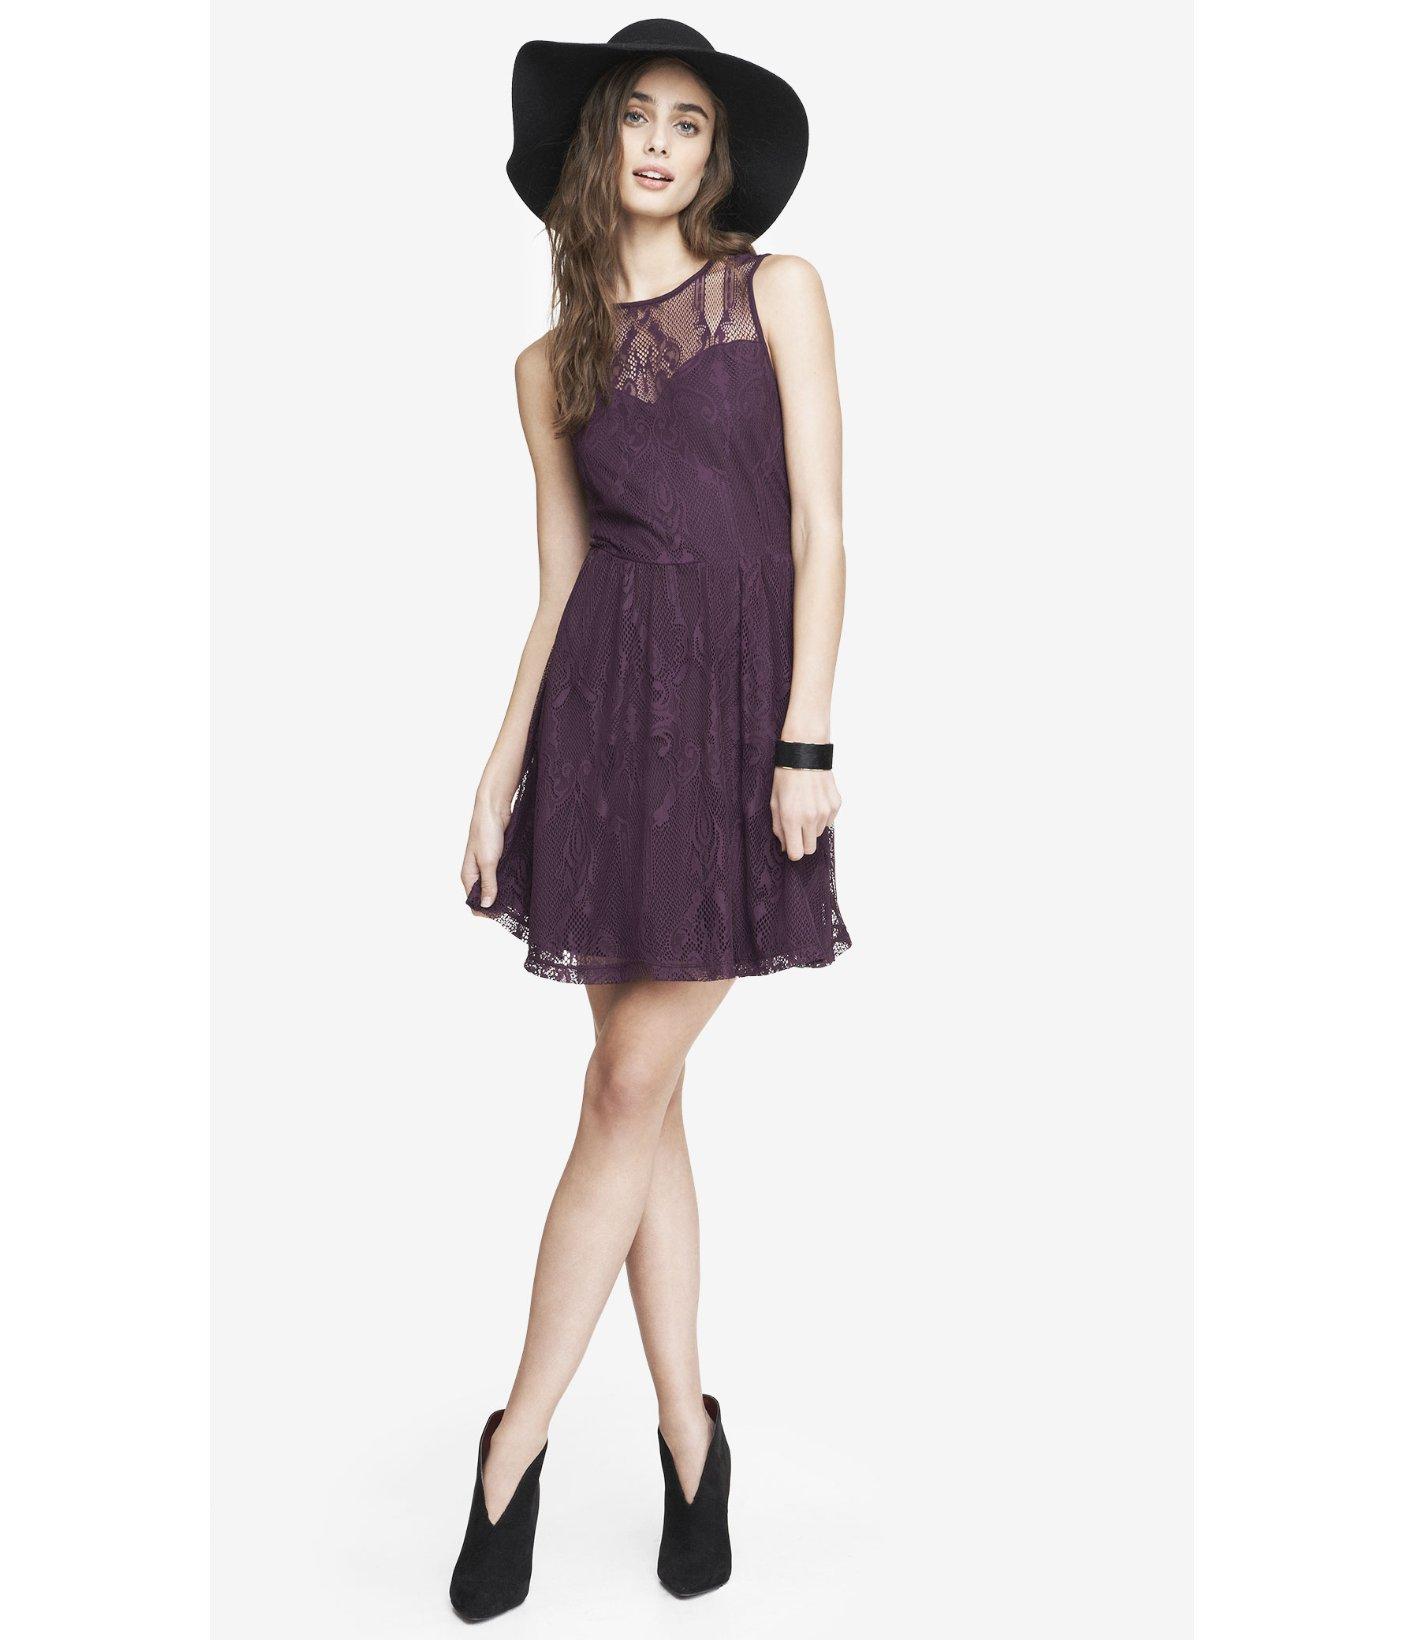 Express Lace Skater Dress - Dark Berry in Purple | Lyst